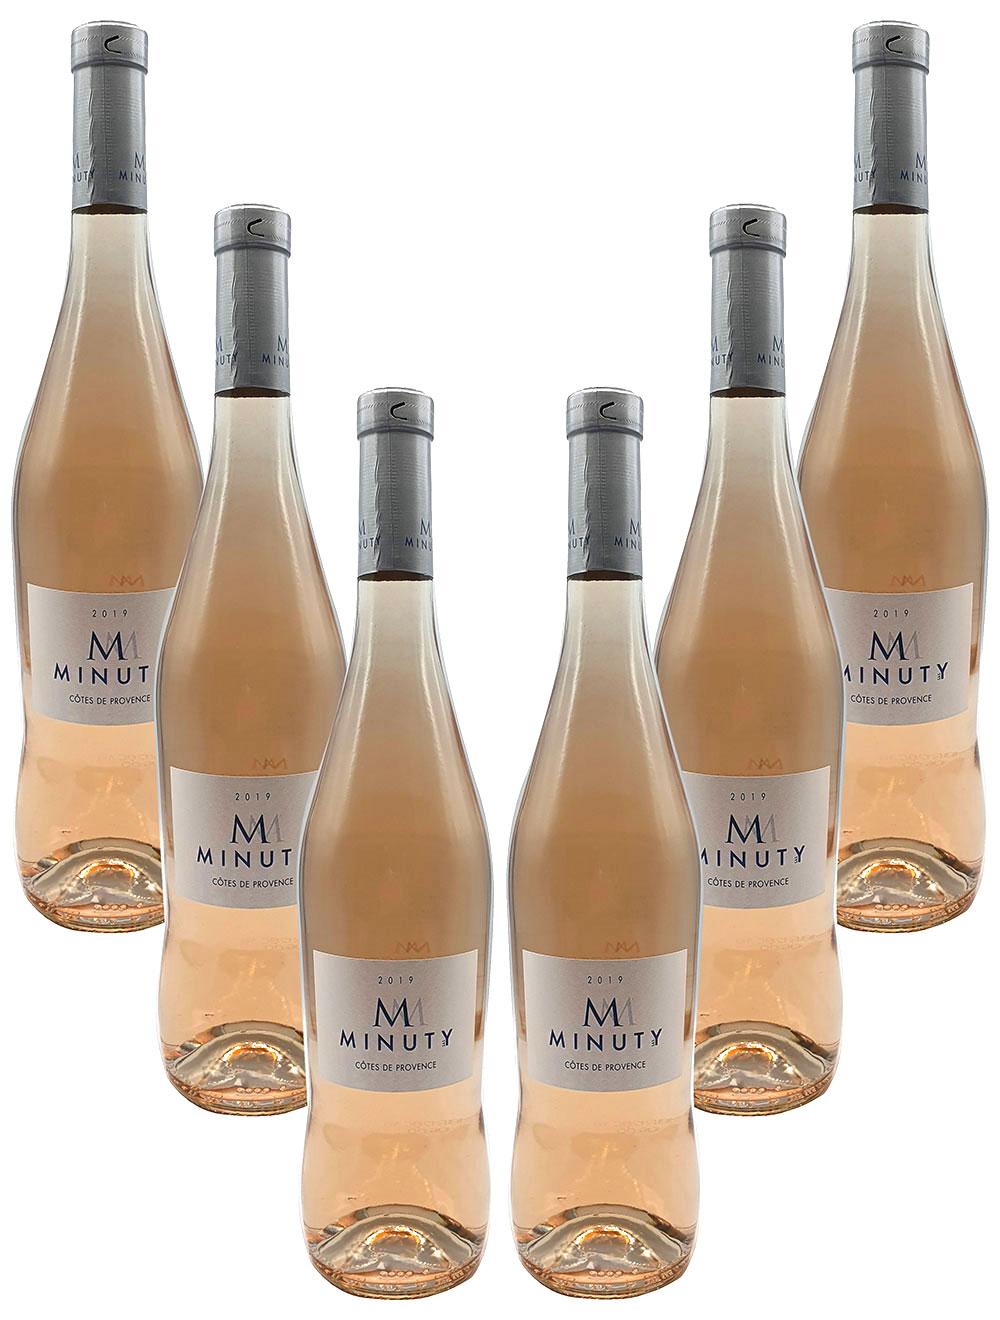 Rose Wein Set - 6x M Minuty Côtes de Provence Rosé 750ml (13% Vol)- [Enthält Sulfite]